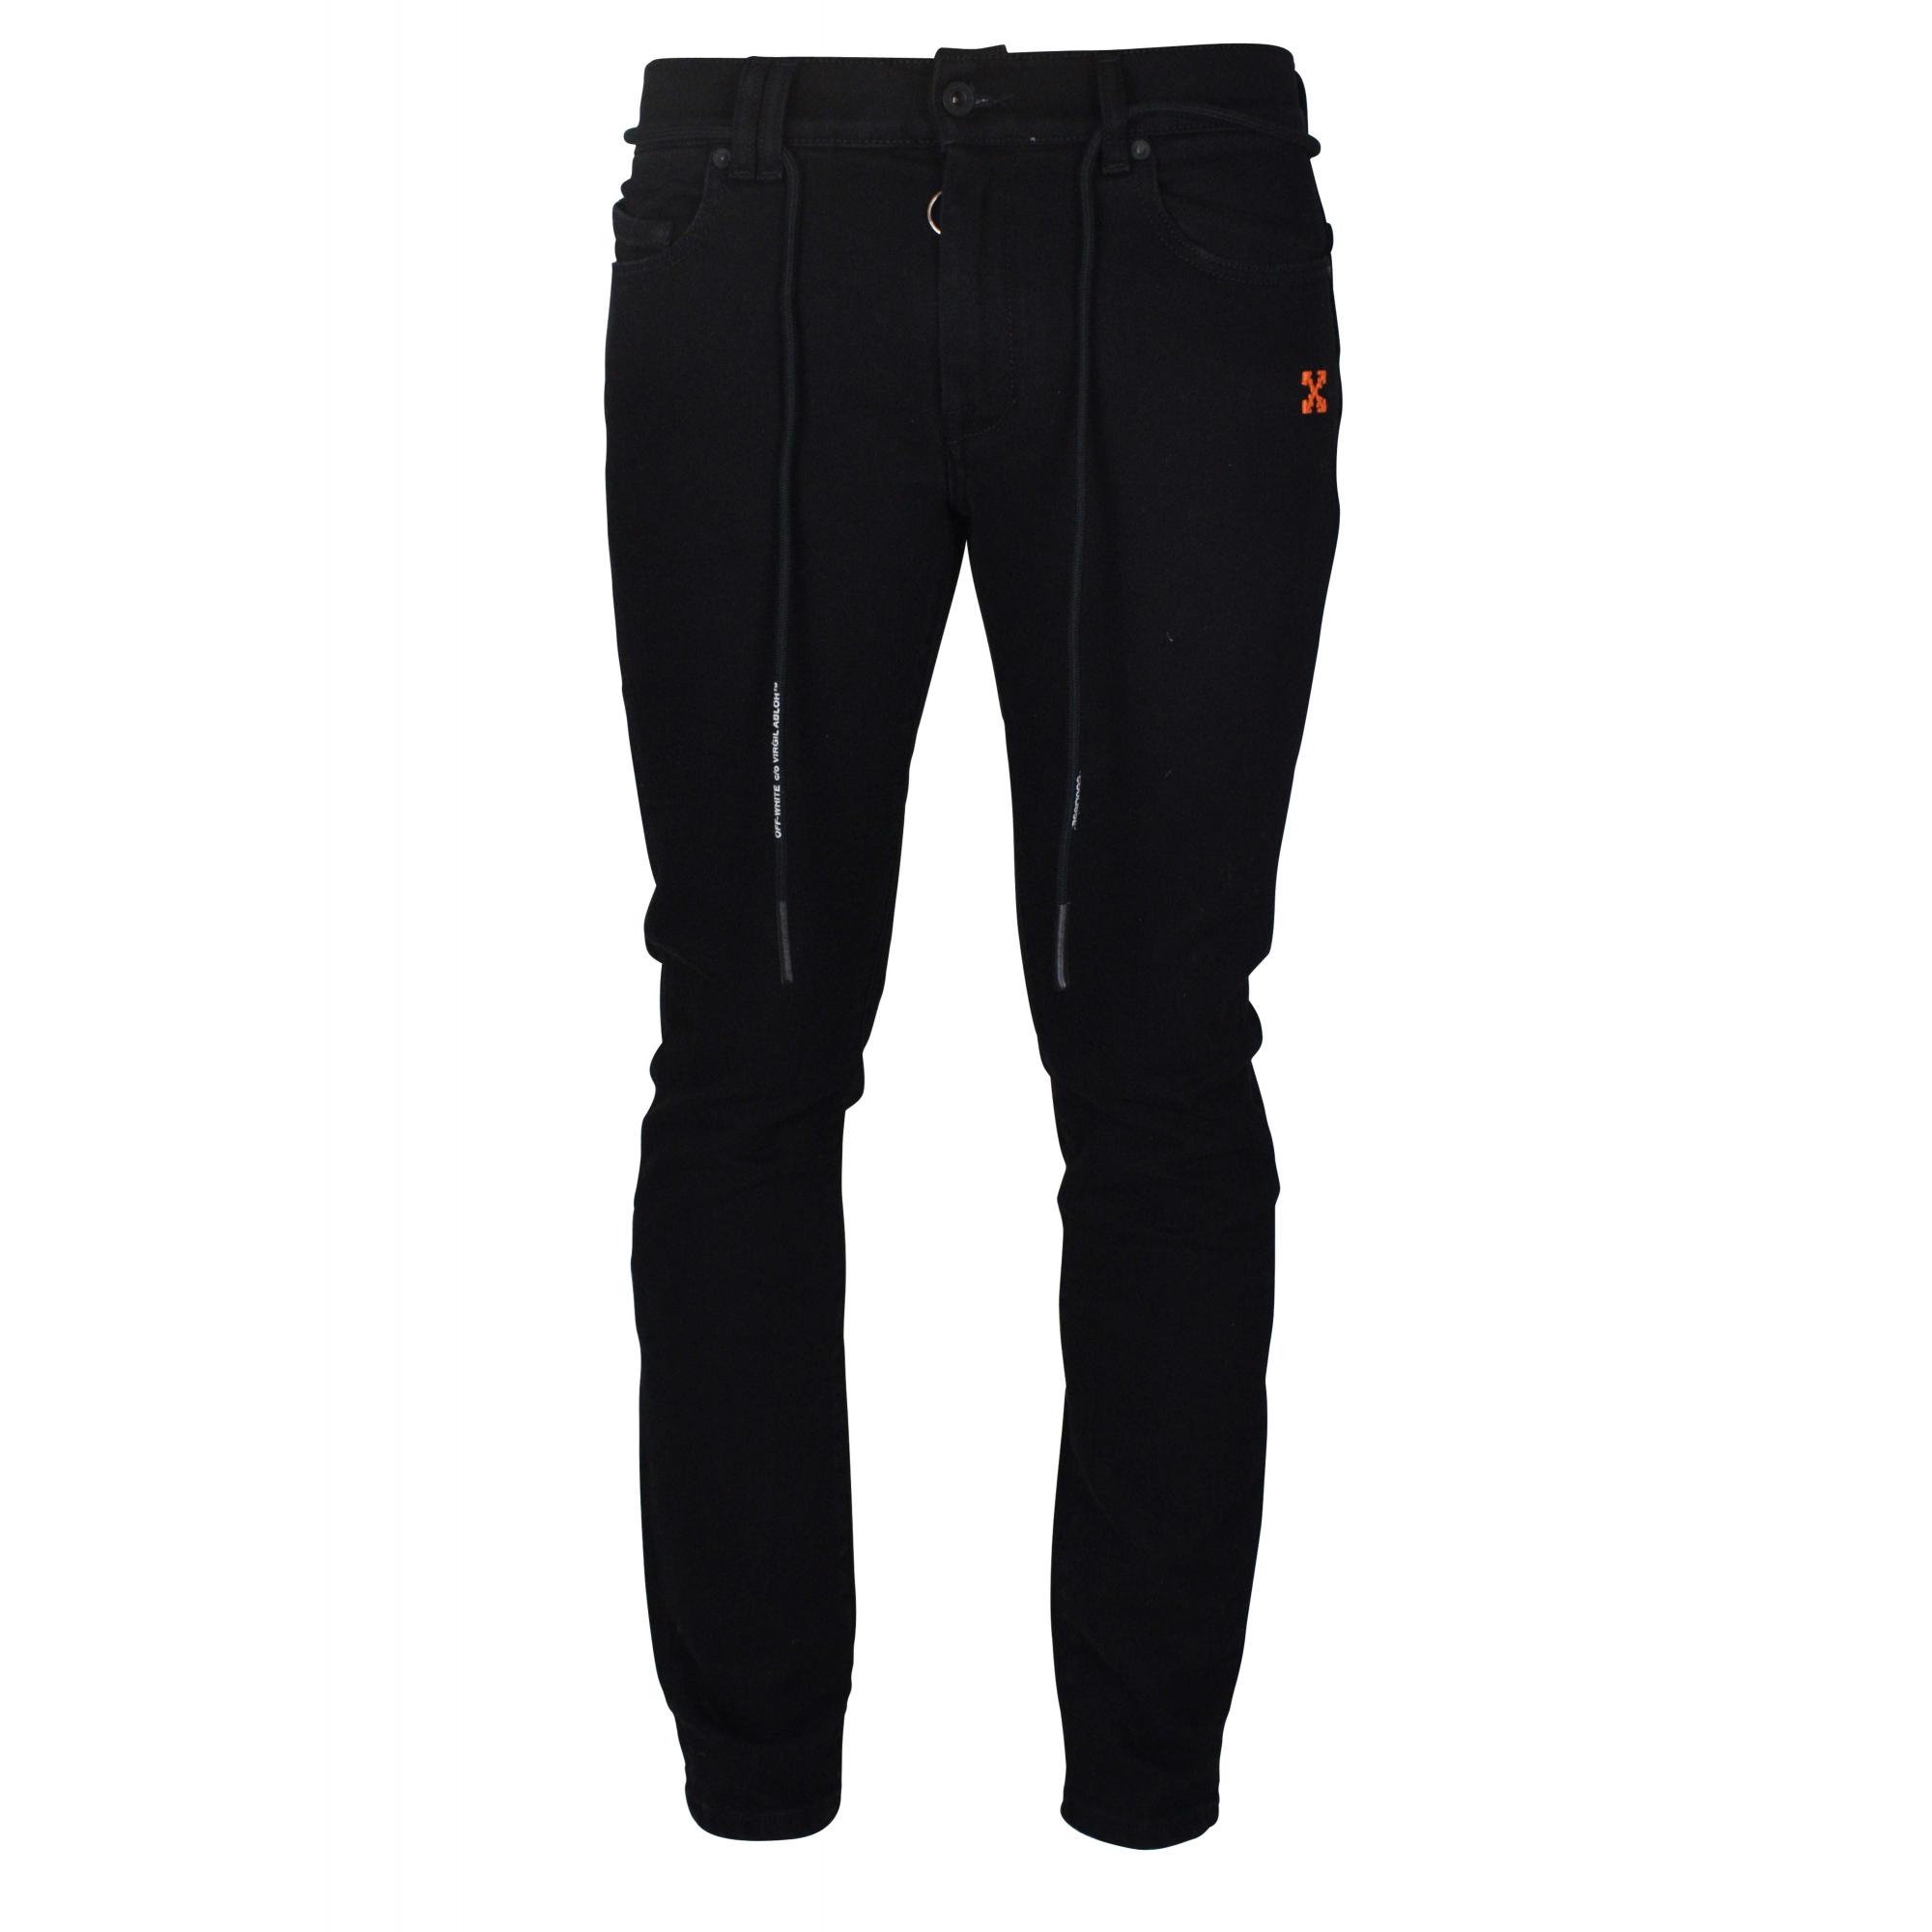 Black Off-White slim jeans.